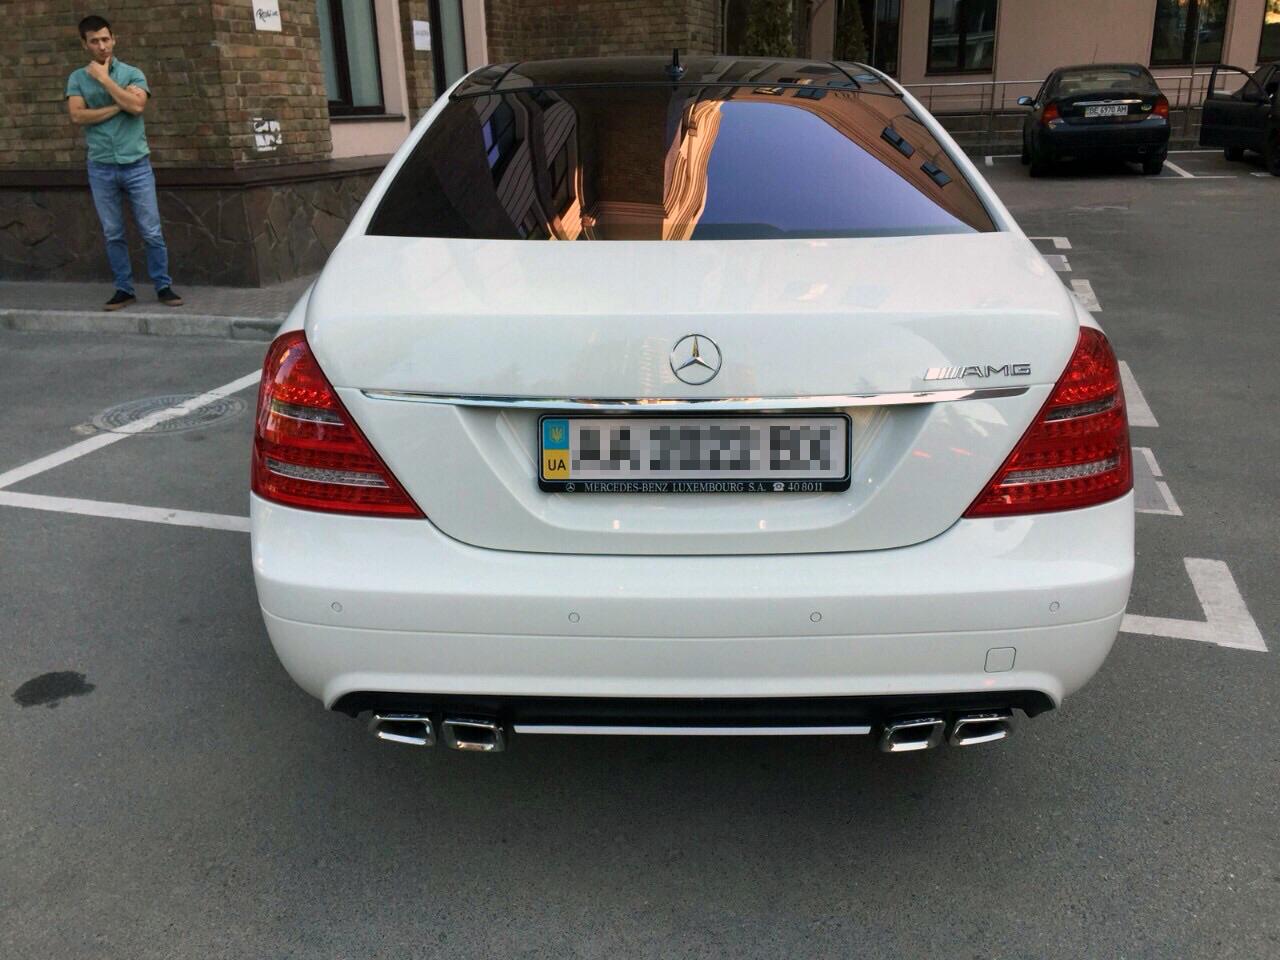 Mercedes-Benz S550 2006 - установка диффузора и насадок на гулишетель S63 + рестайлинговые фонари